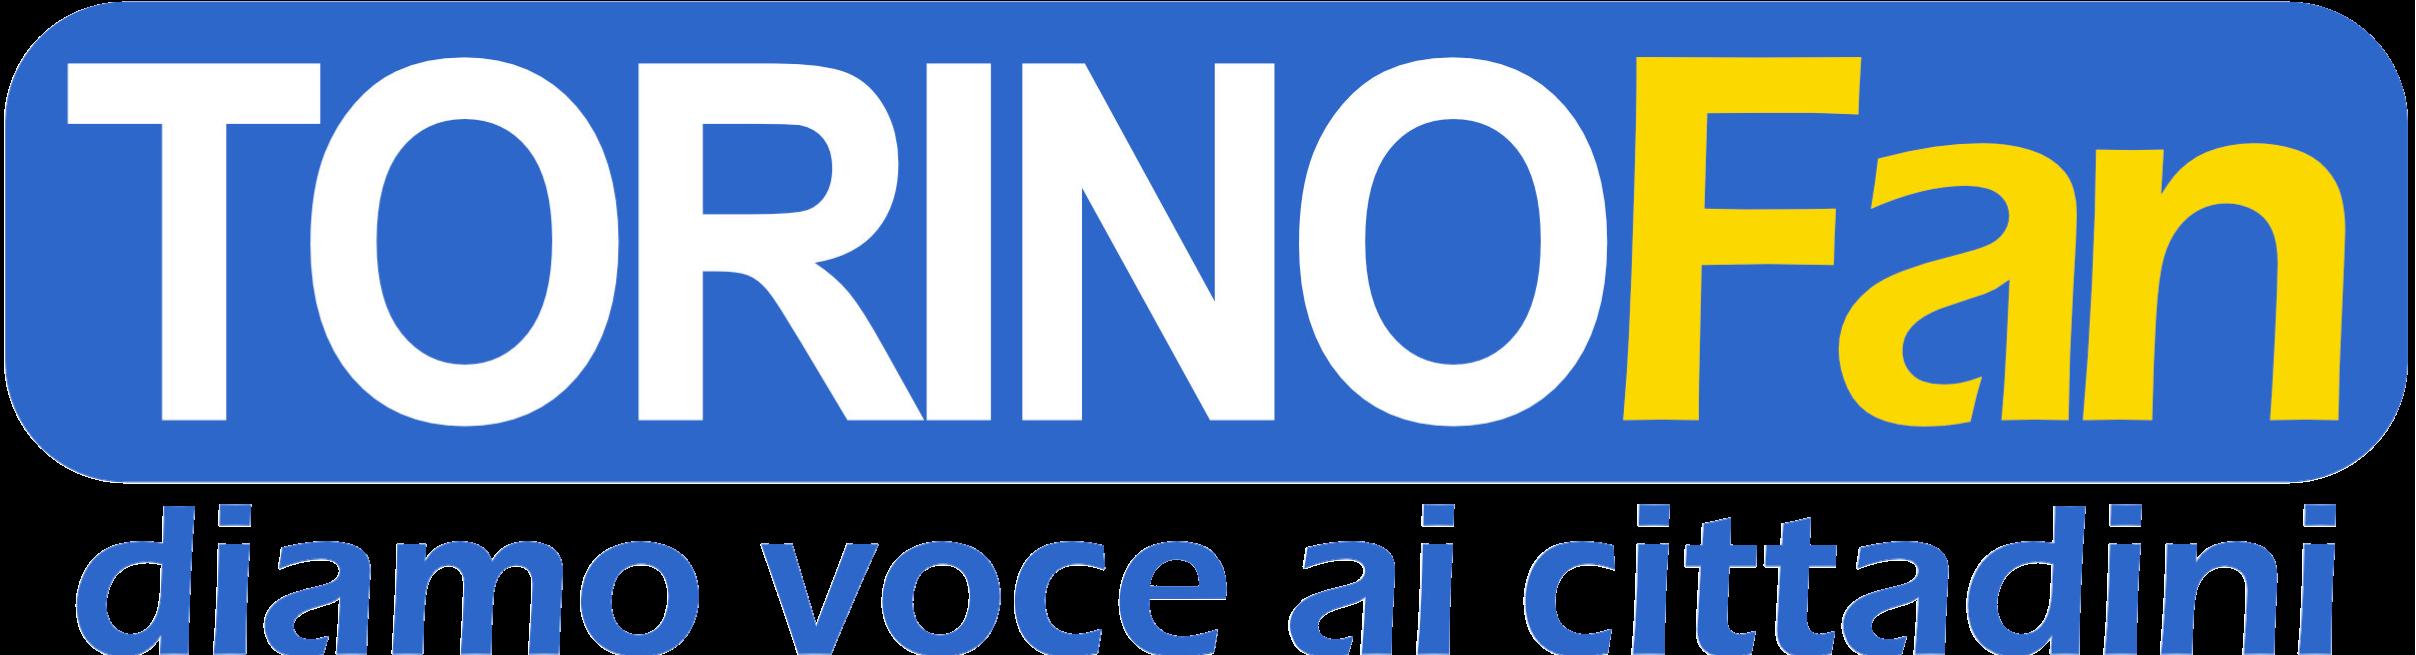 Torino Fan